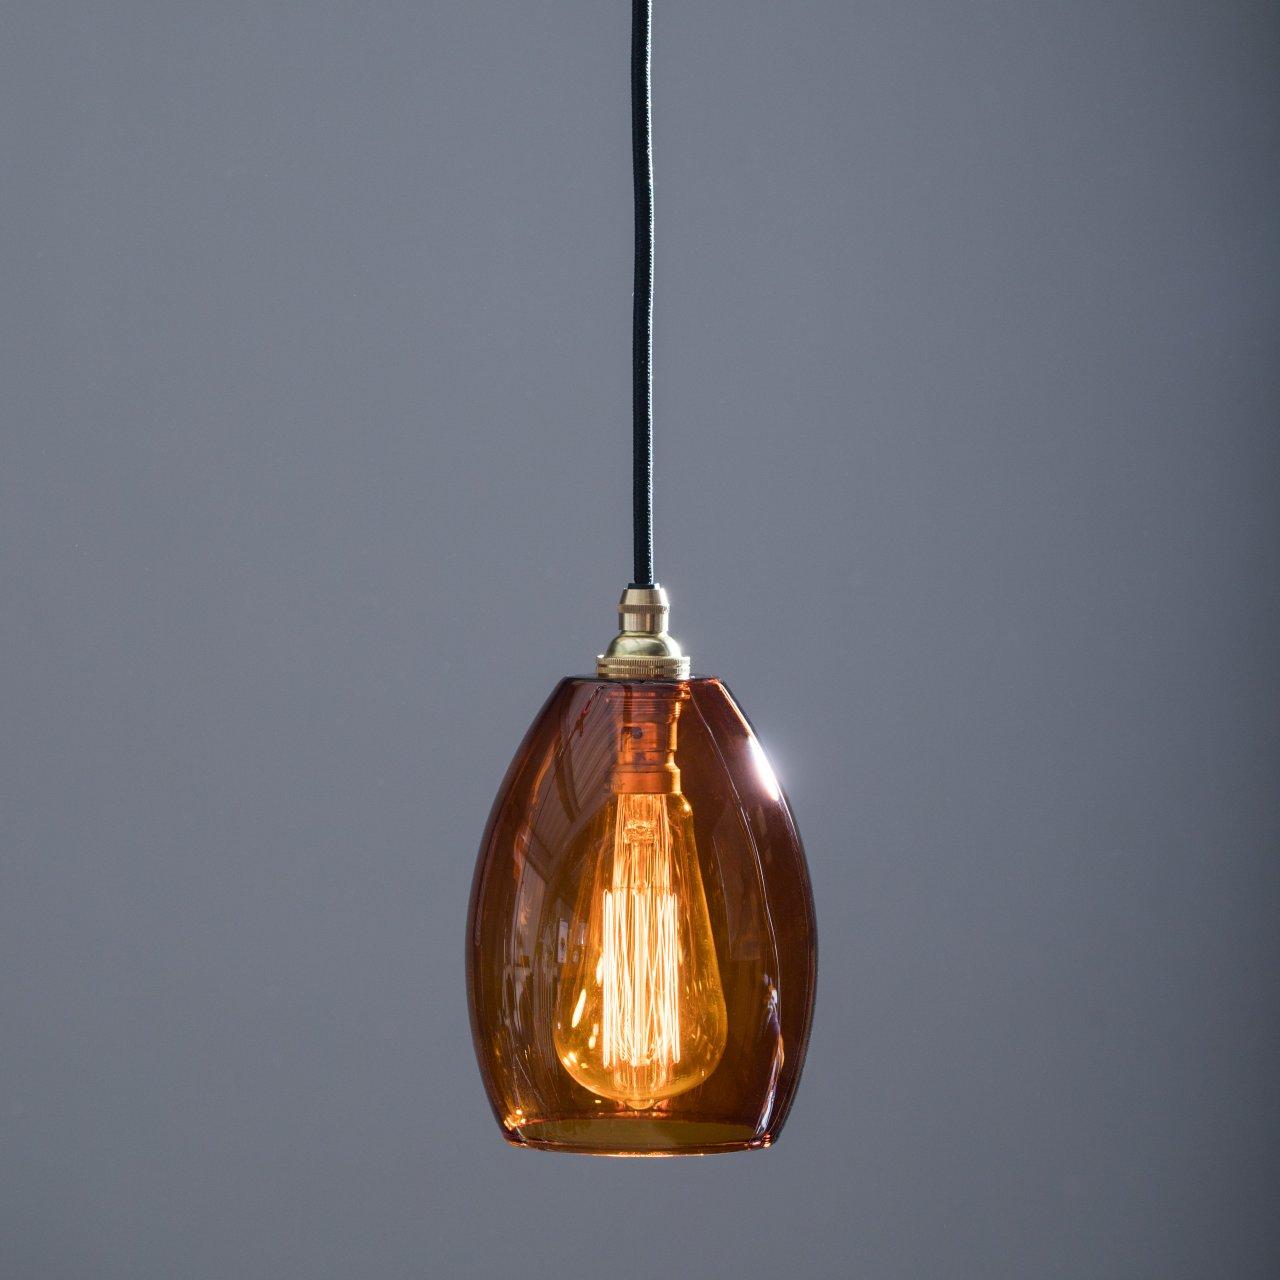 592a77c58b5 Amber Glass Pendant Light Bertie Mid - Glow Lighting